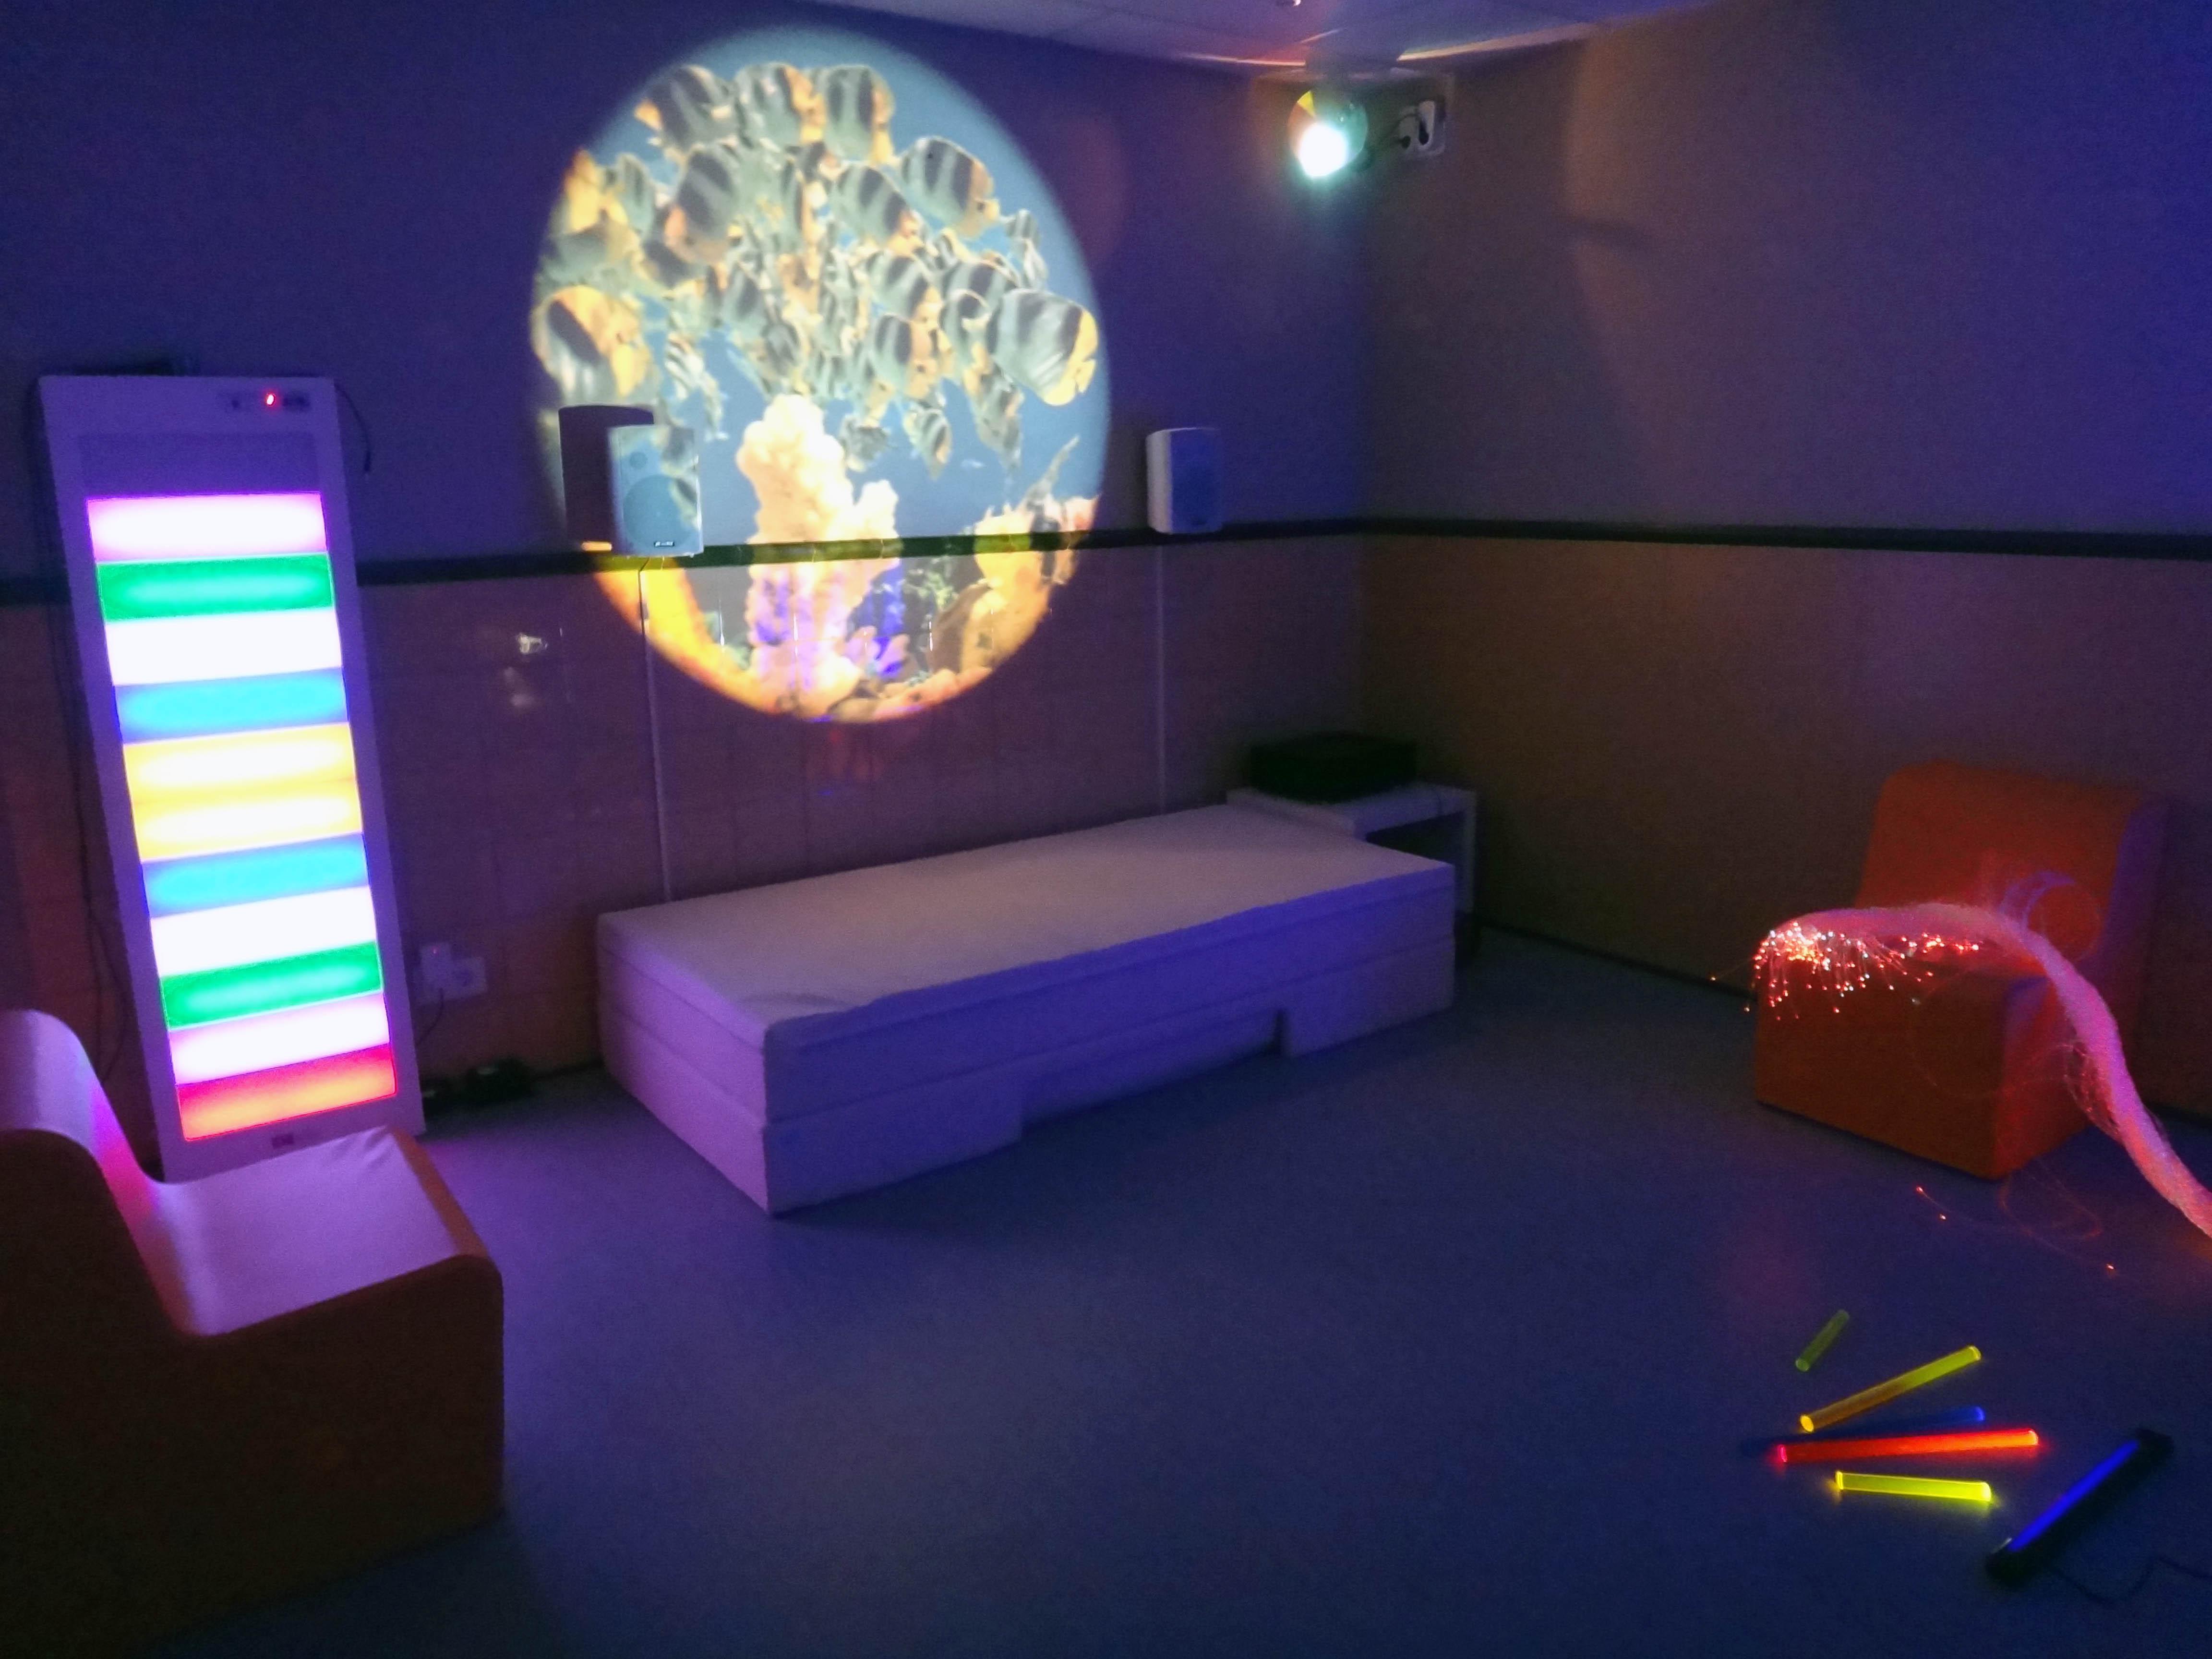 Instal·lacions sala d'estimulació multisensorial Centre Psicopedagògic Mare de Déu de Montserrat